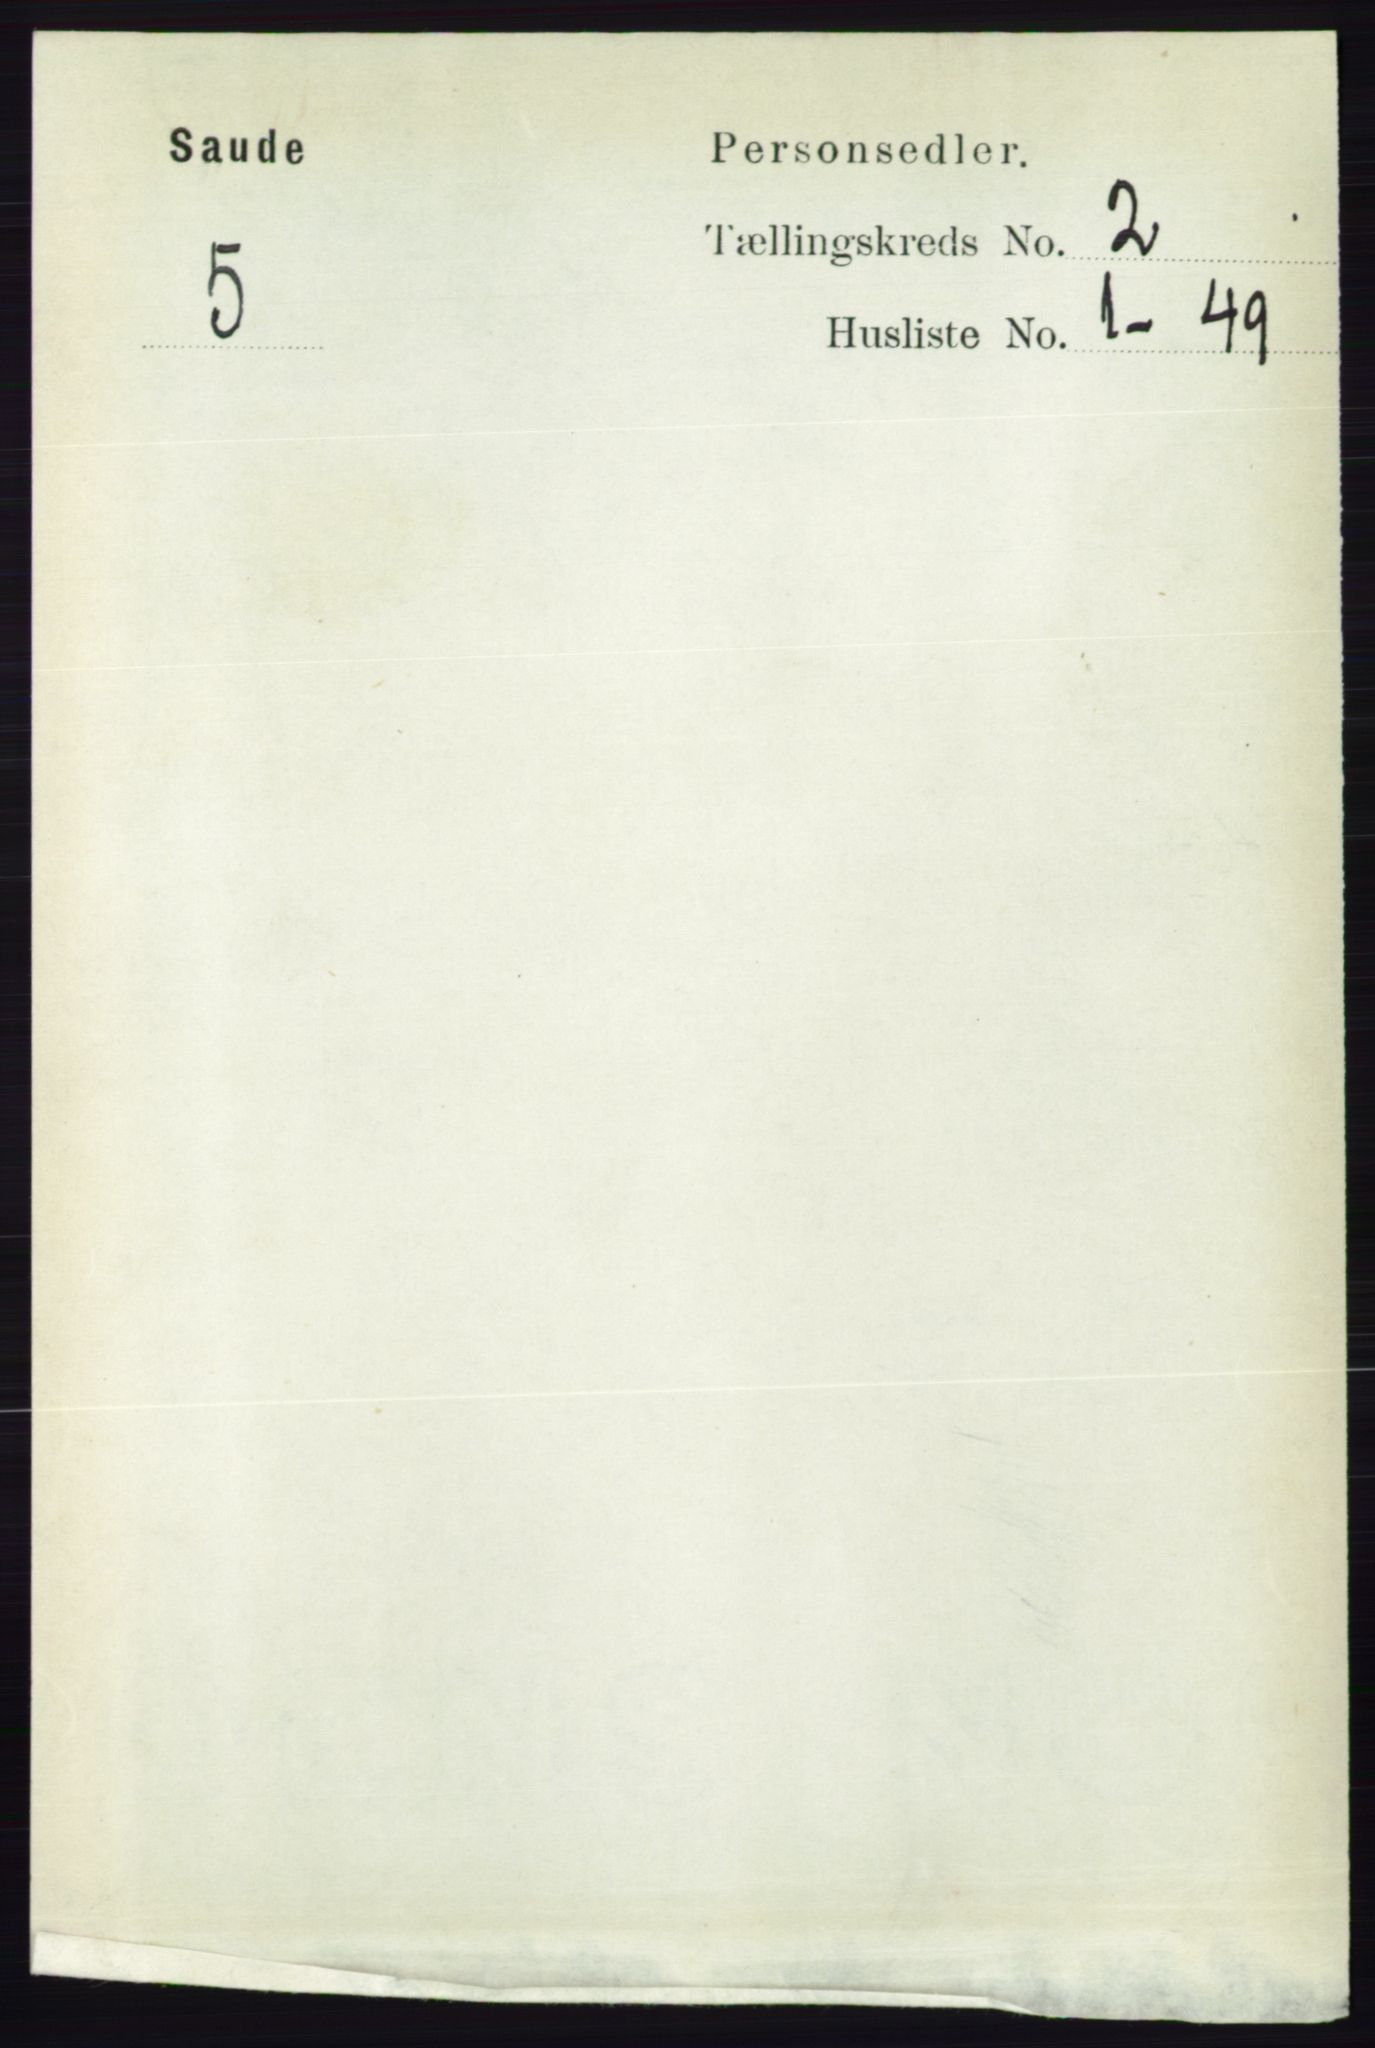 RA, Folketelling 1891 for 0822 Sauherad herred, 1891, s. 453